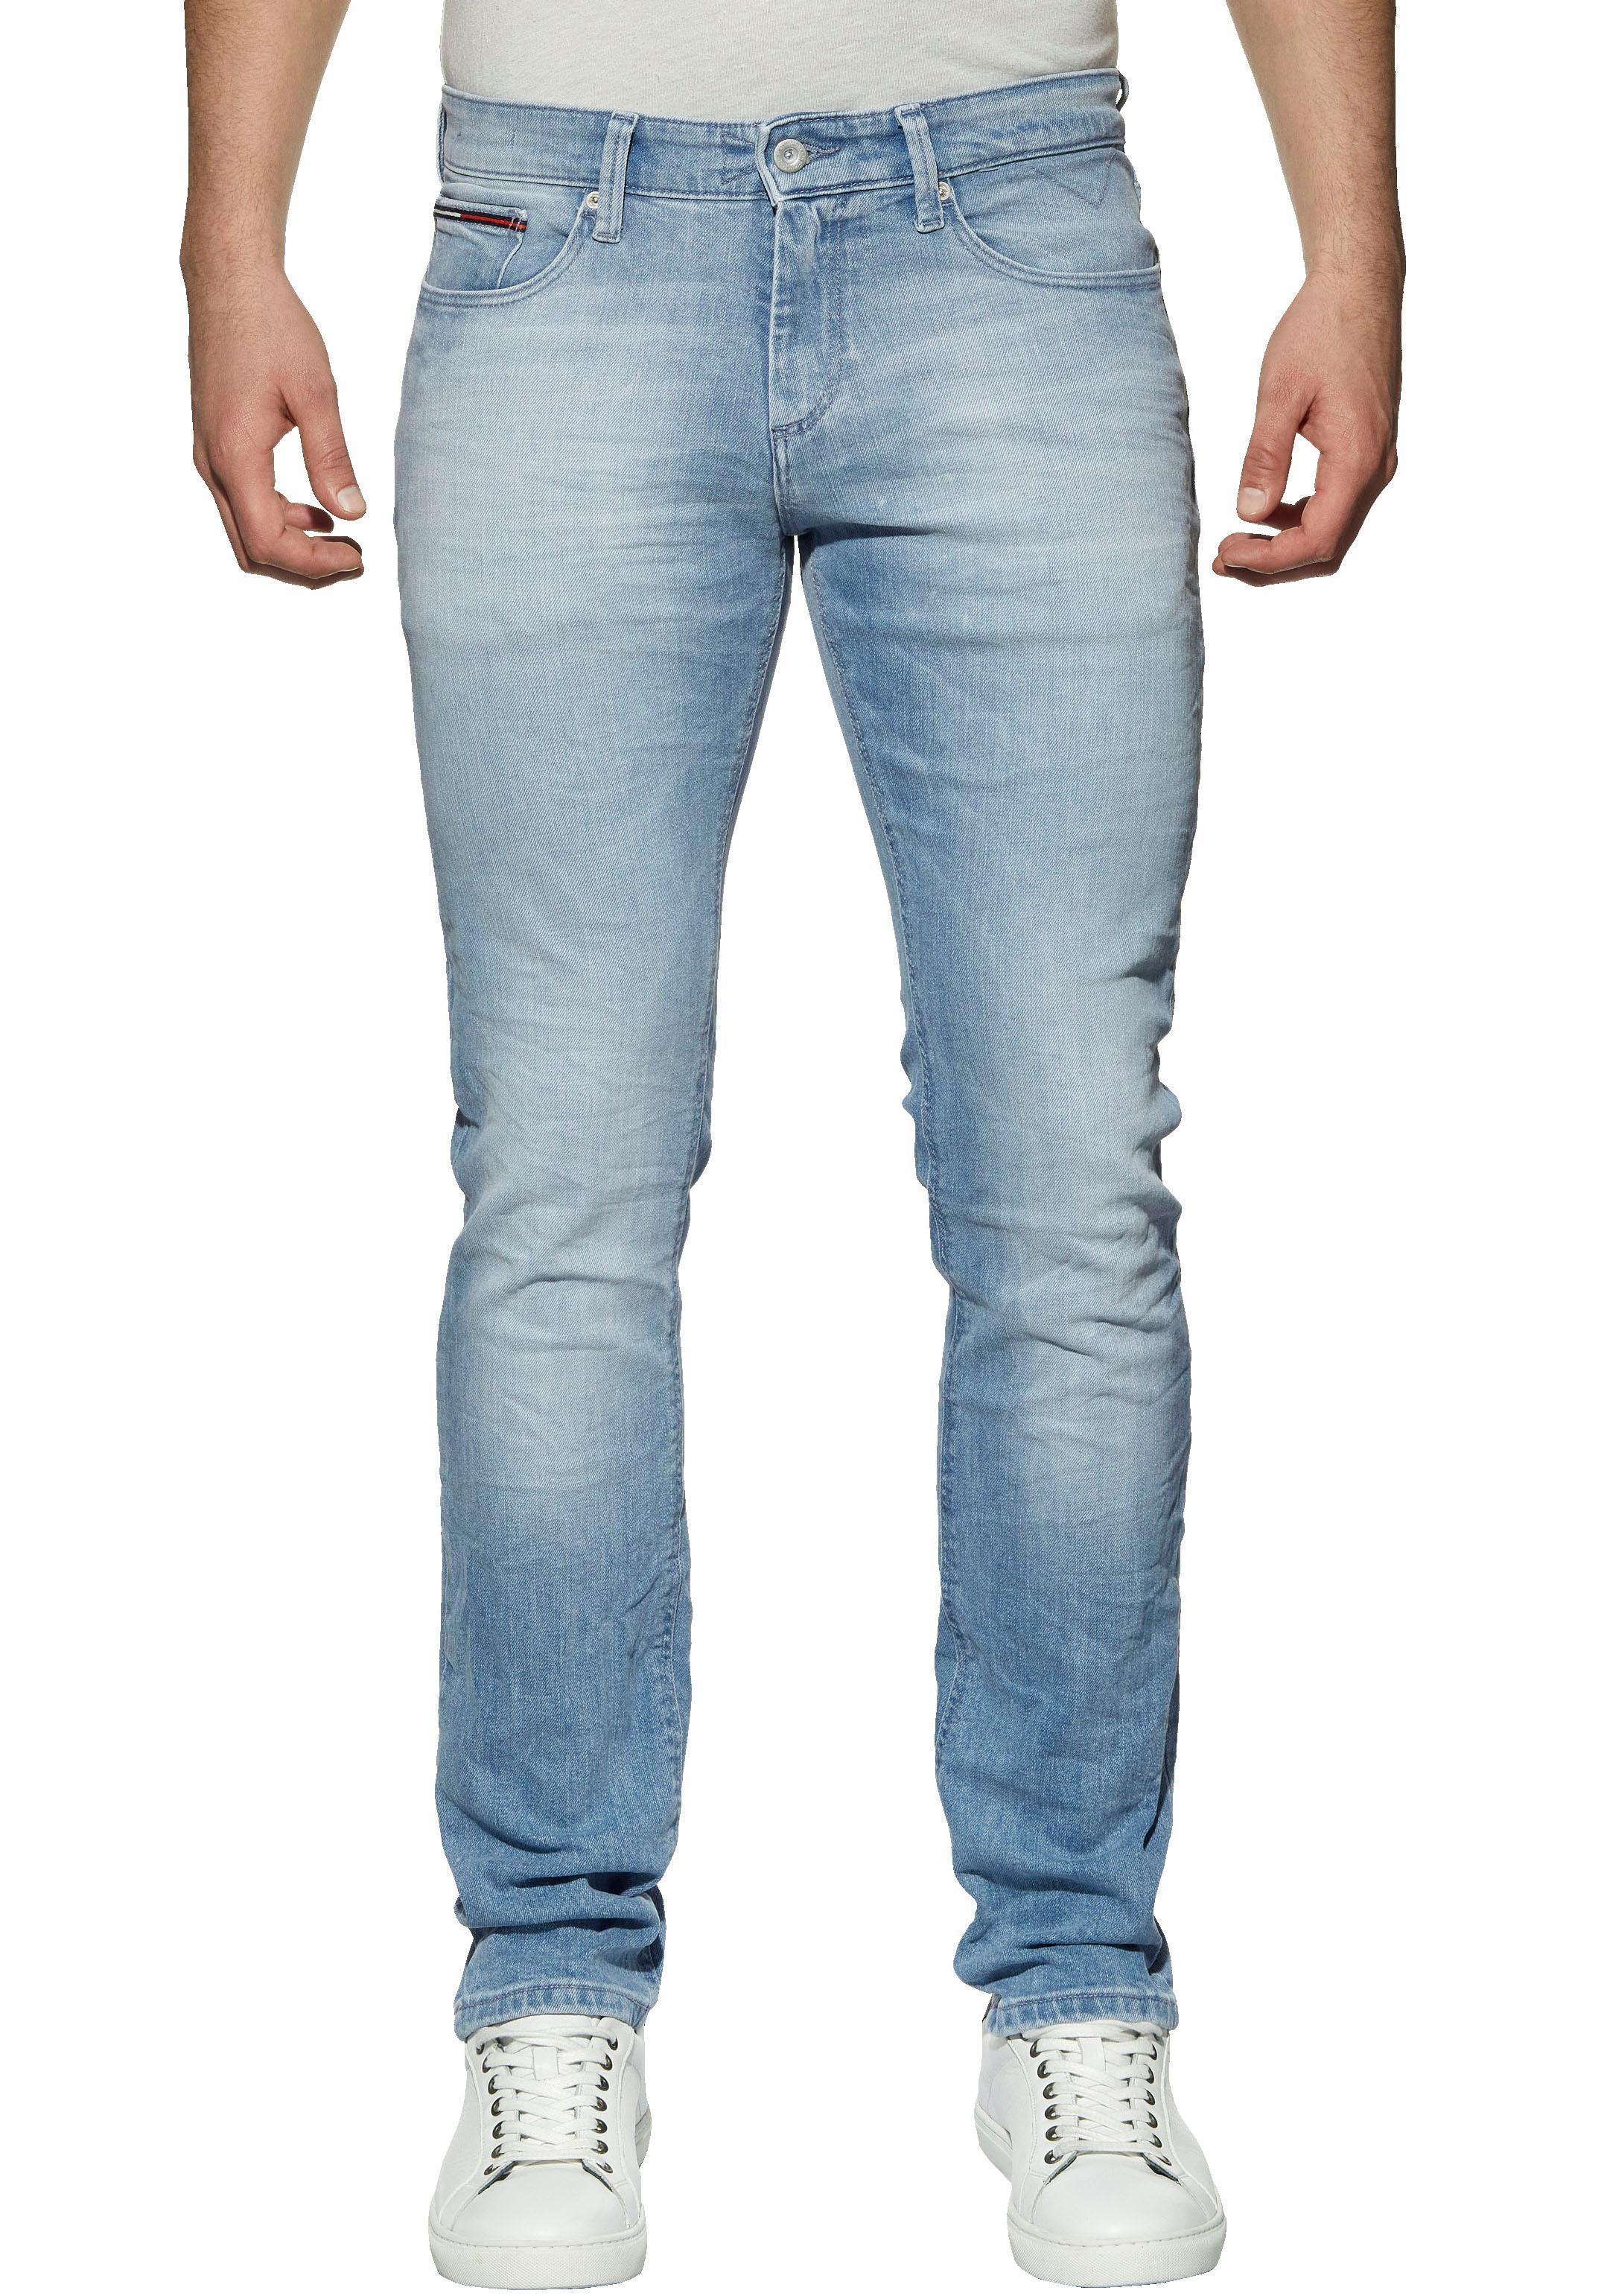 TOMMY JEANS Slim-fit-Jeans SLIM SCANTON | Bekleidung > Jeans | Tommy Jeans